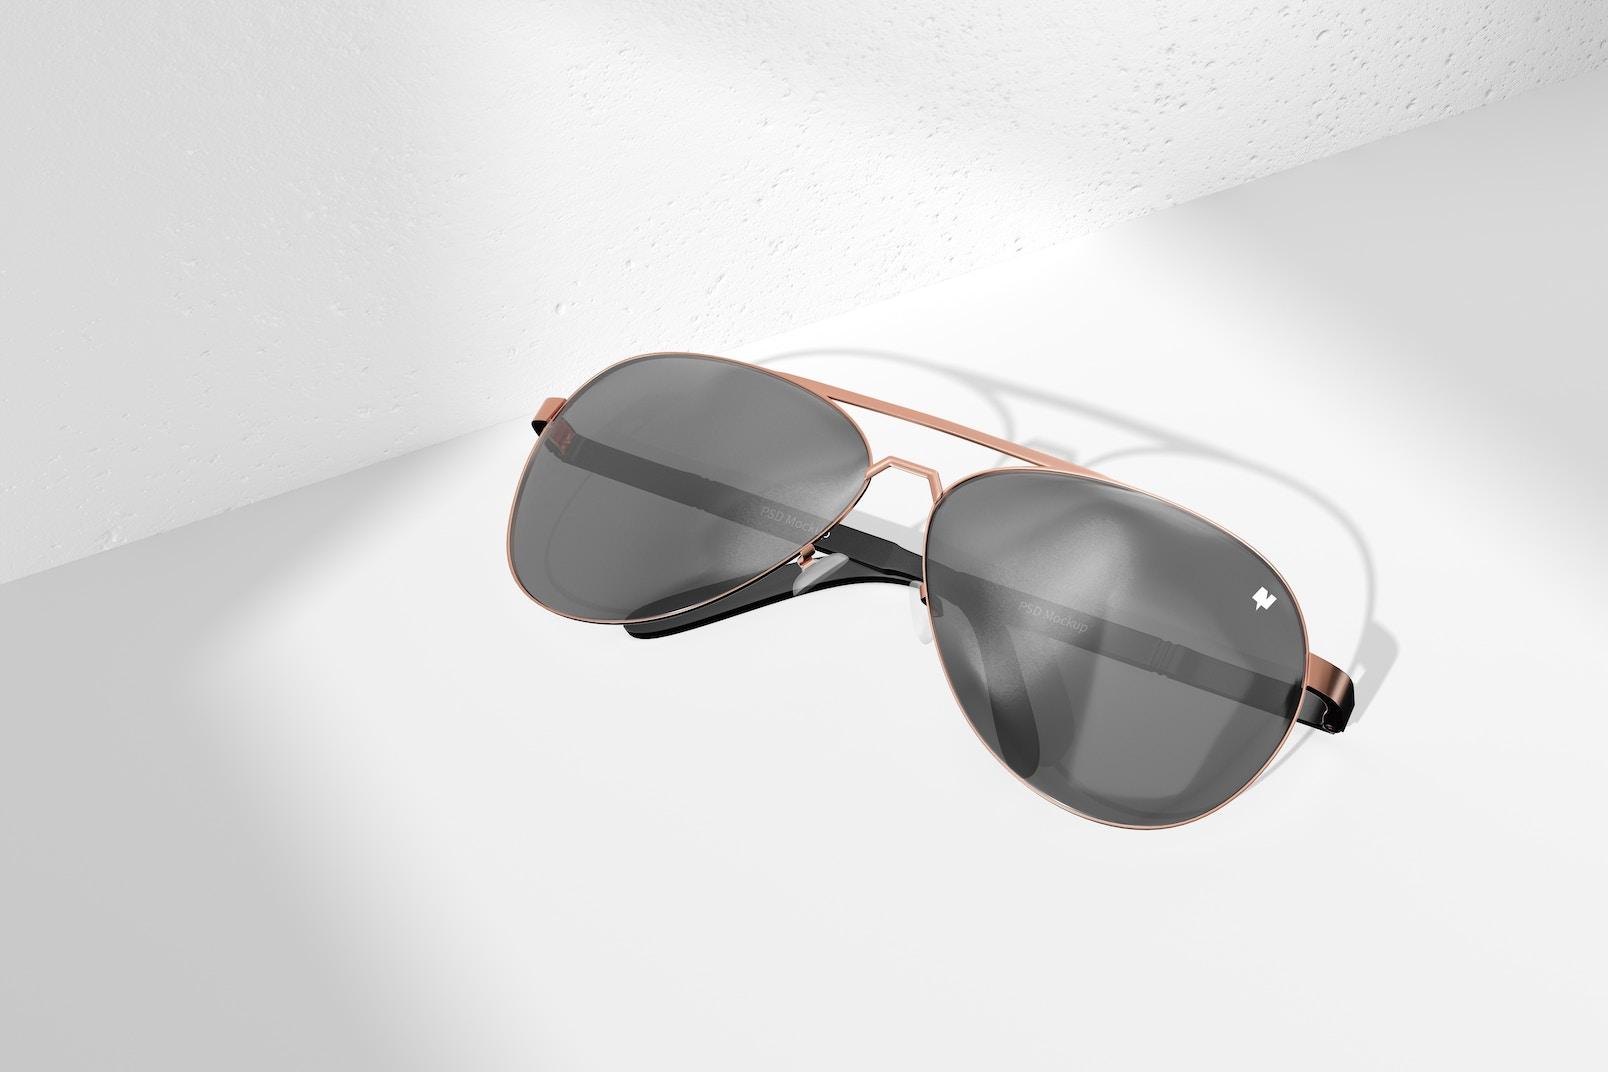 Aviator Sunglasses Mockup, Top View